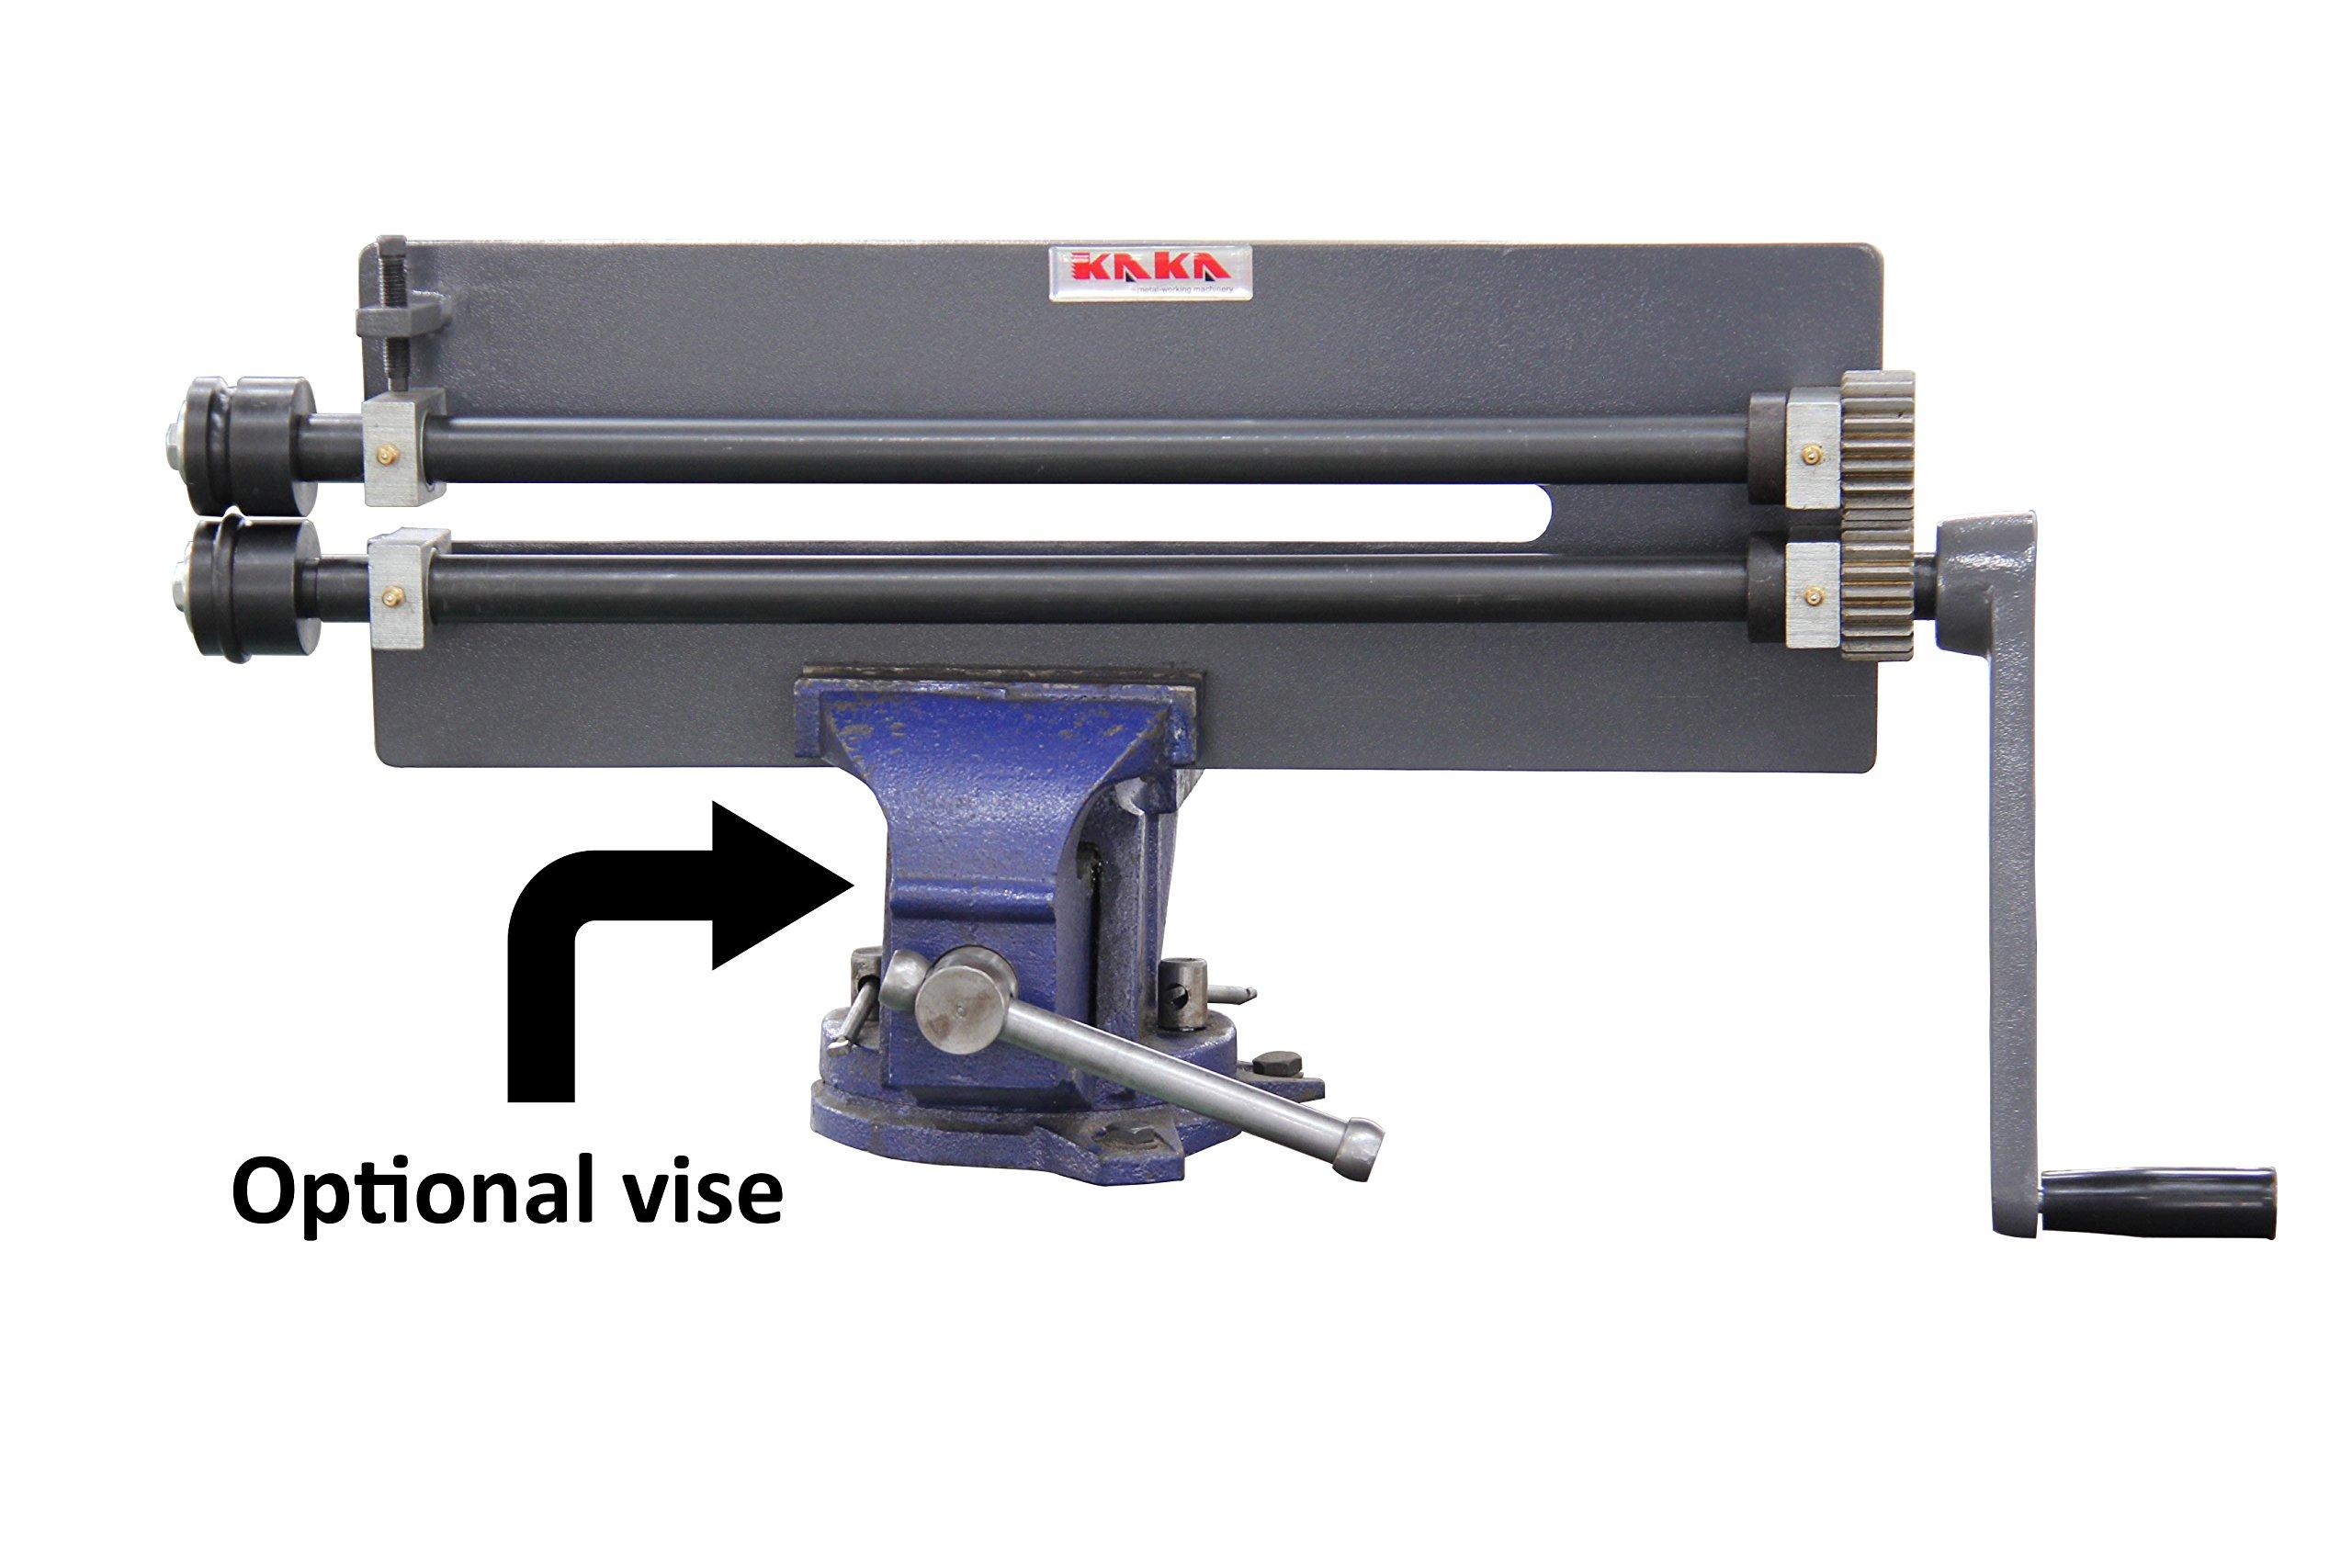 KAKA Industrial RM-18 Rotary Machine, 18'' Throat Depth Sheet Metal Fabrication Bead Roller by kakaindustrial